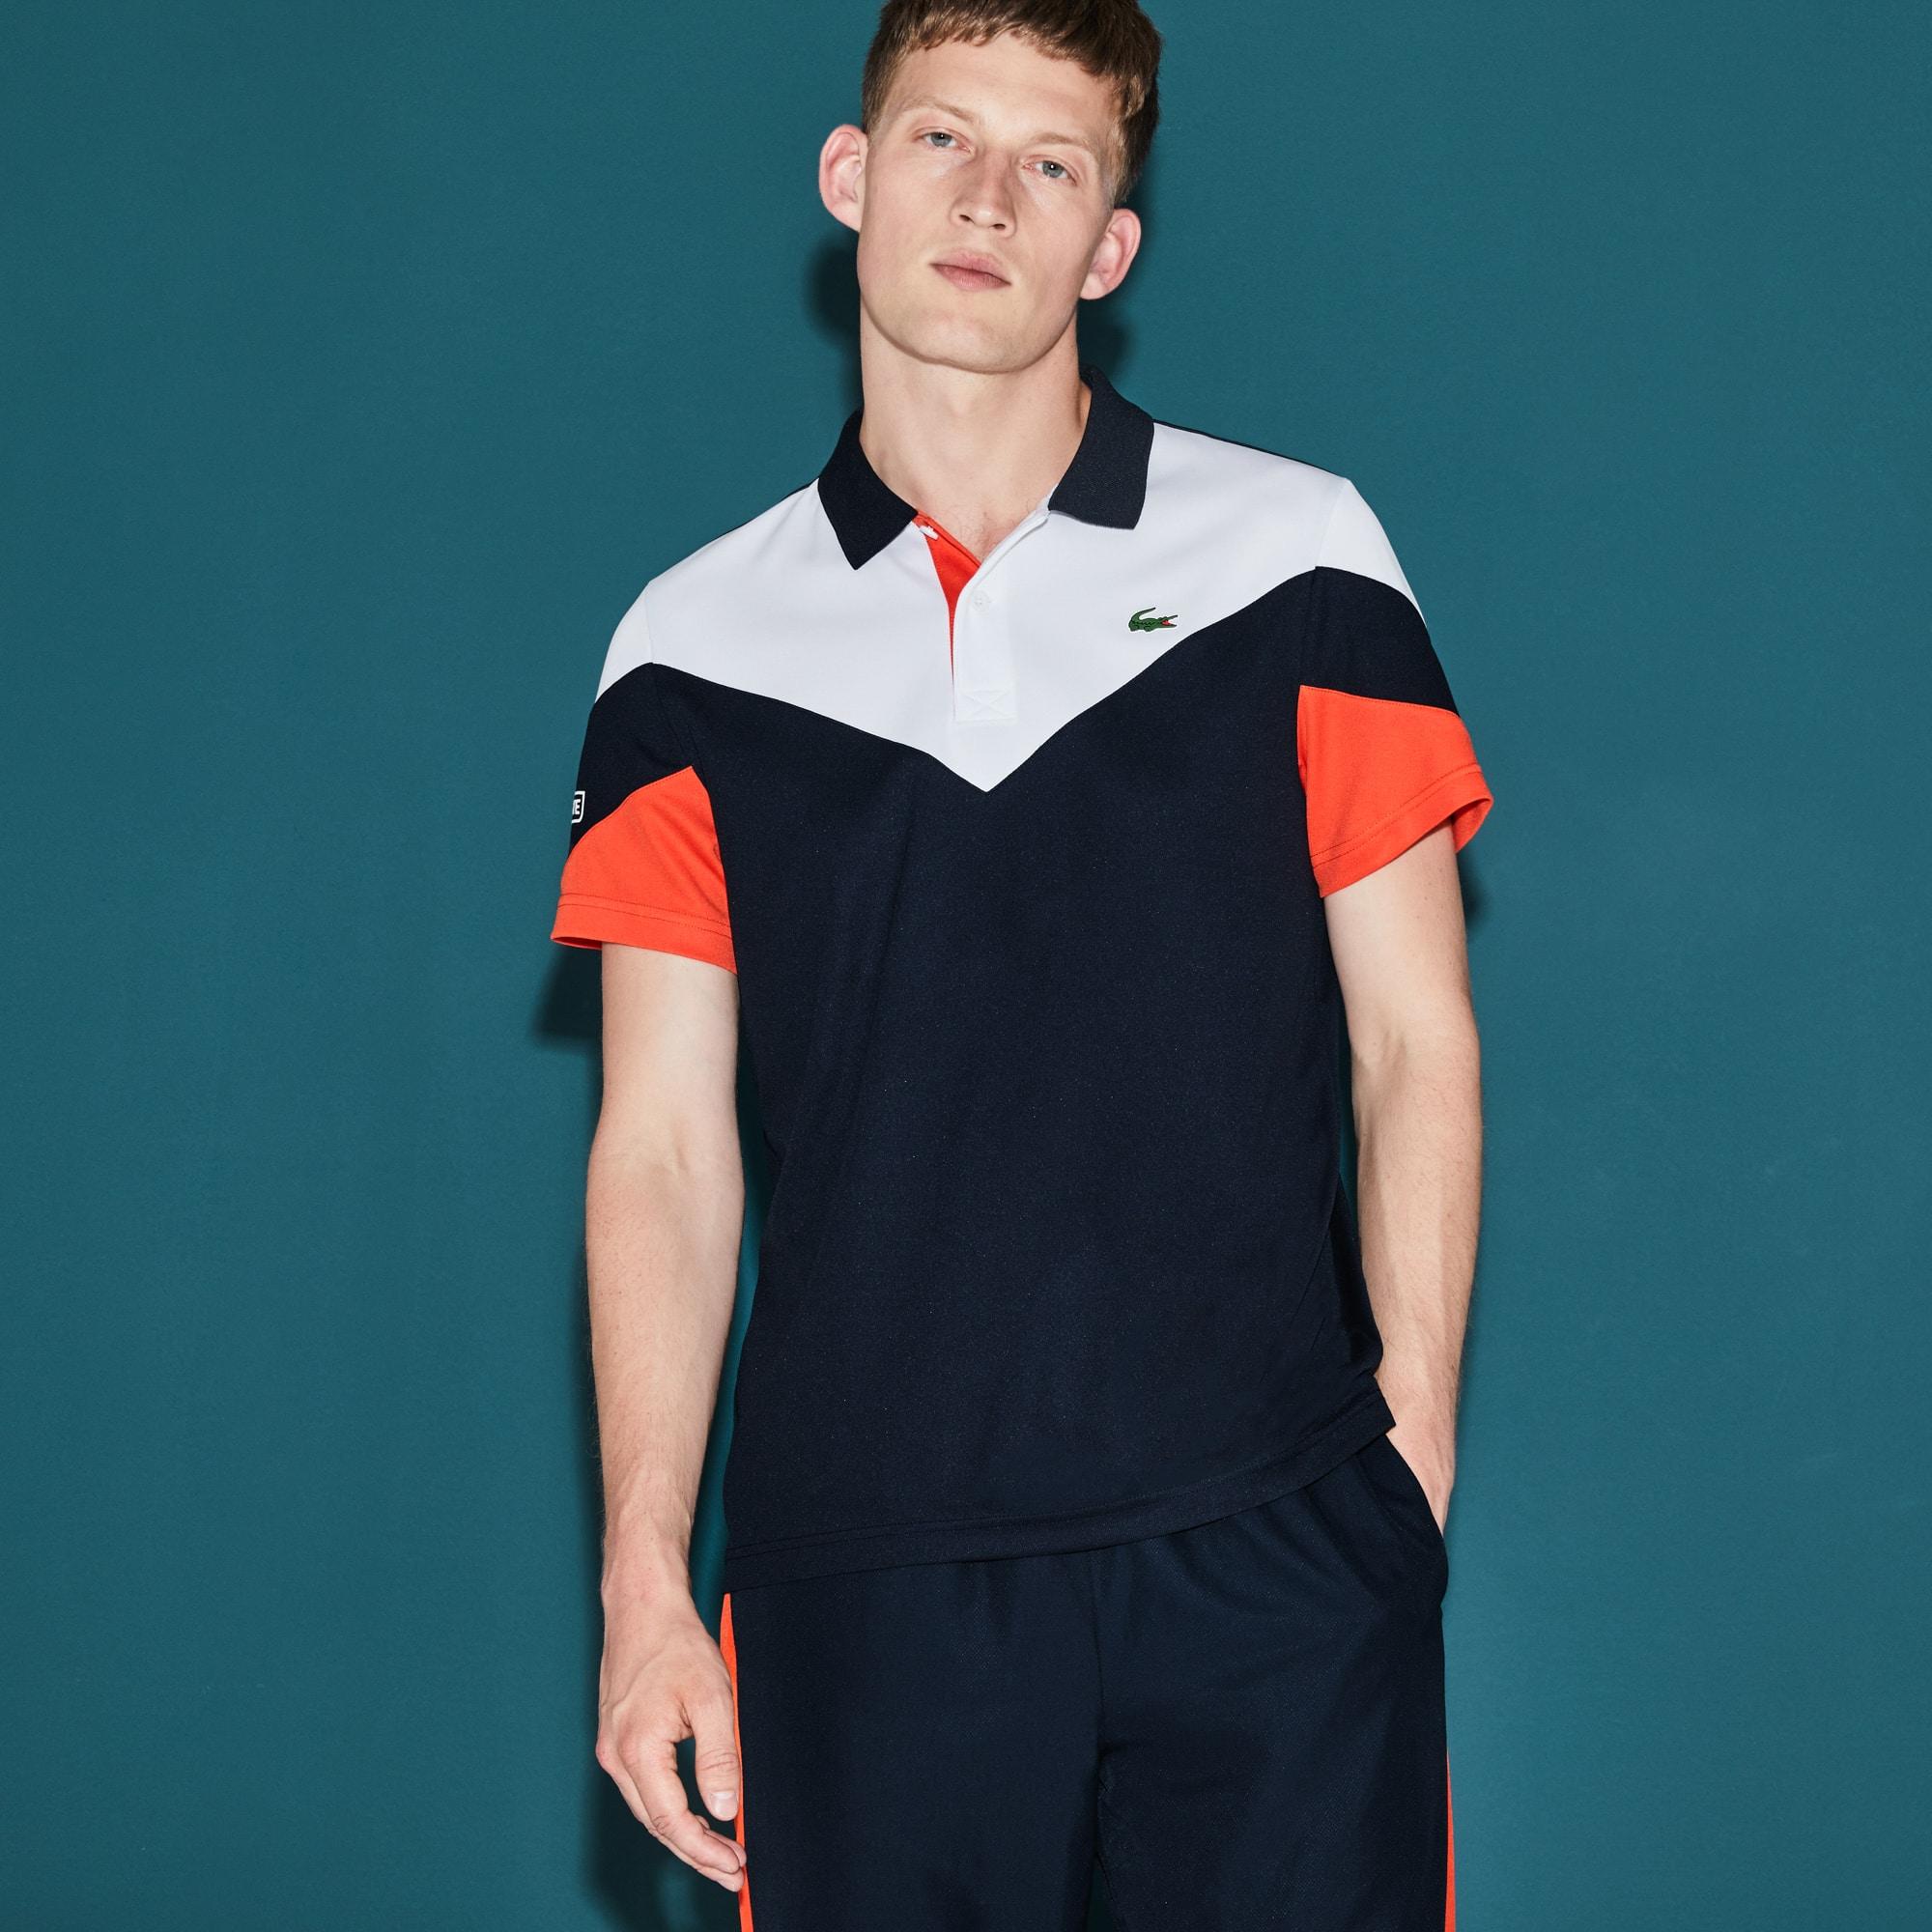 Polo Lacoste SPORT Tennis Masculina em Piqué Técnico com Color Block